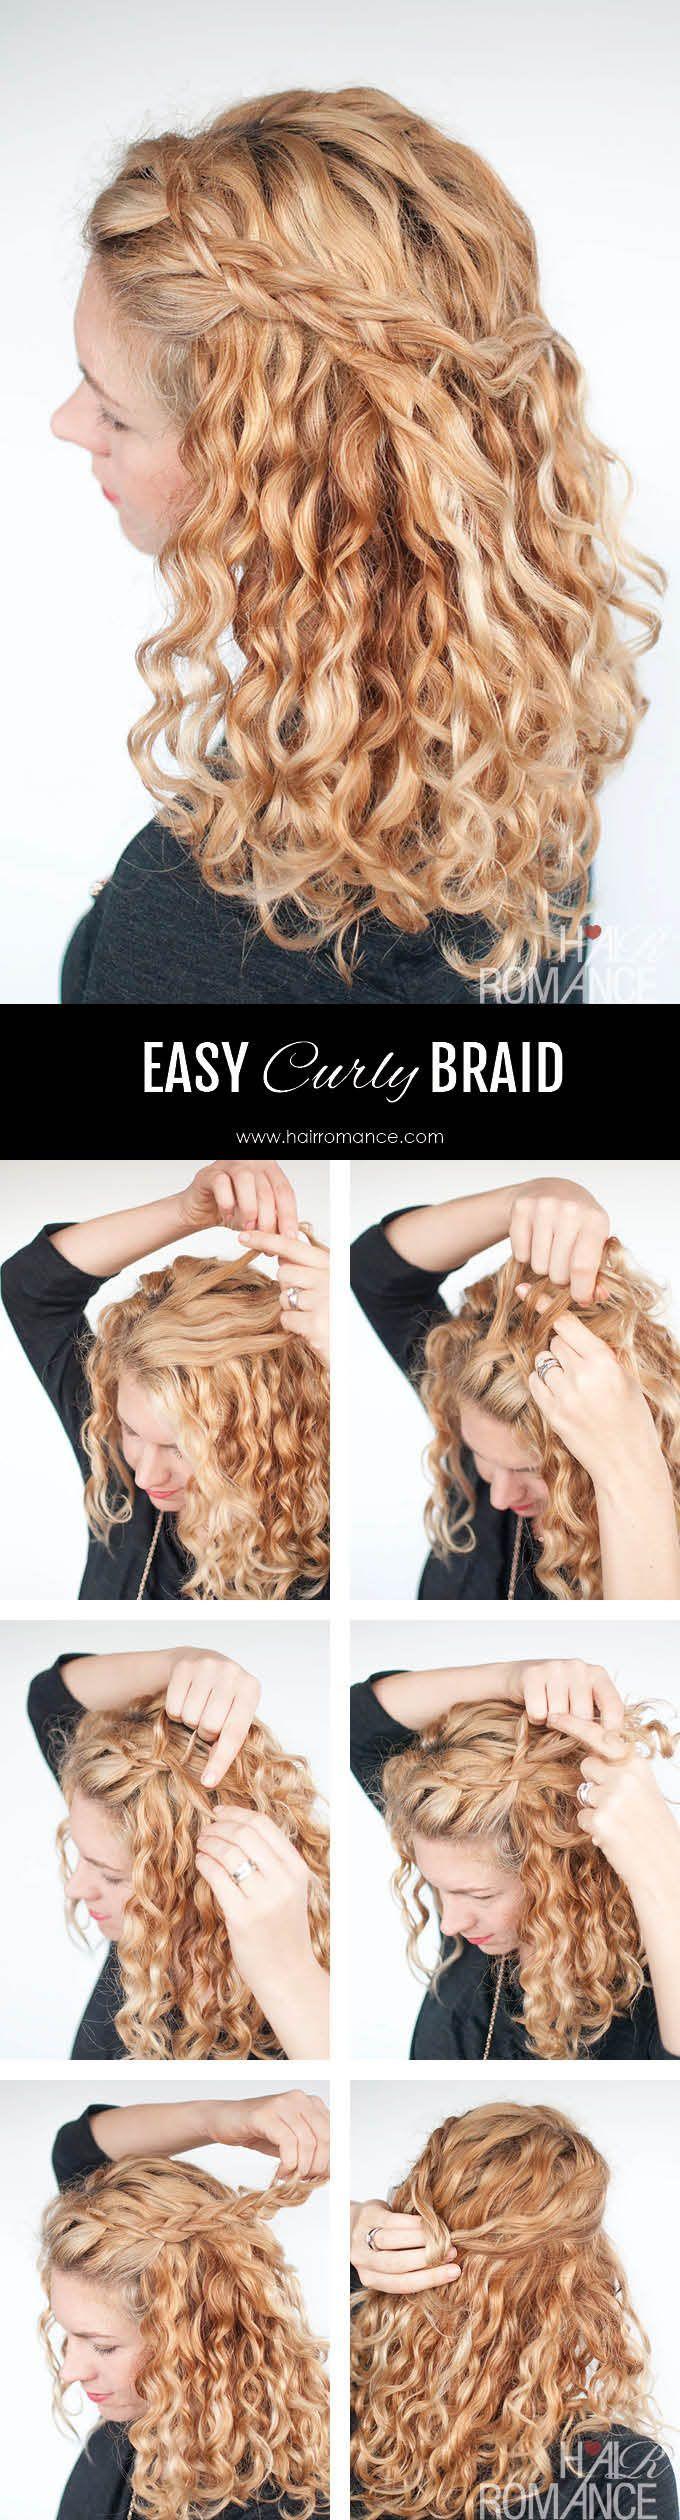 easy braid tutorial